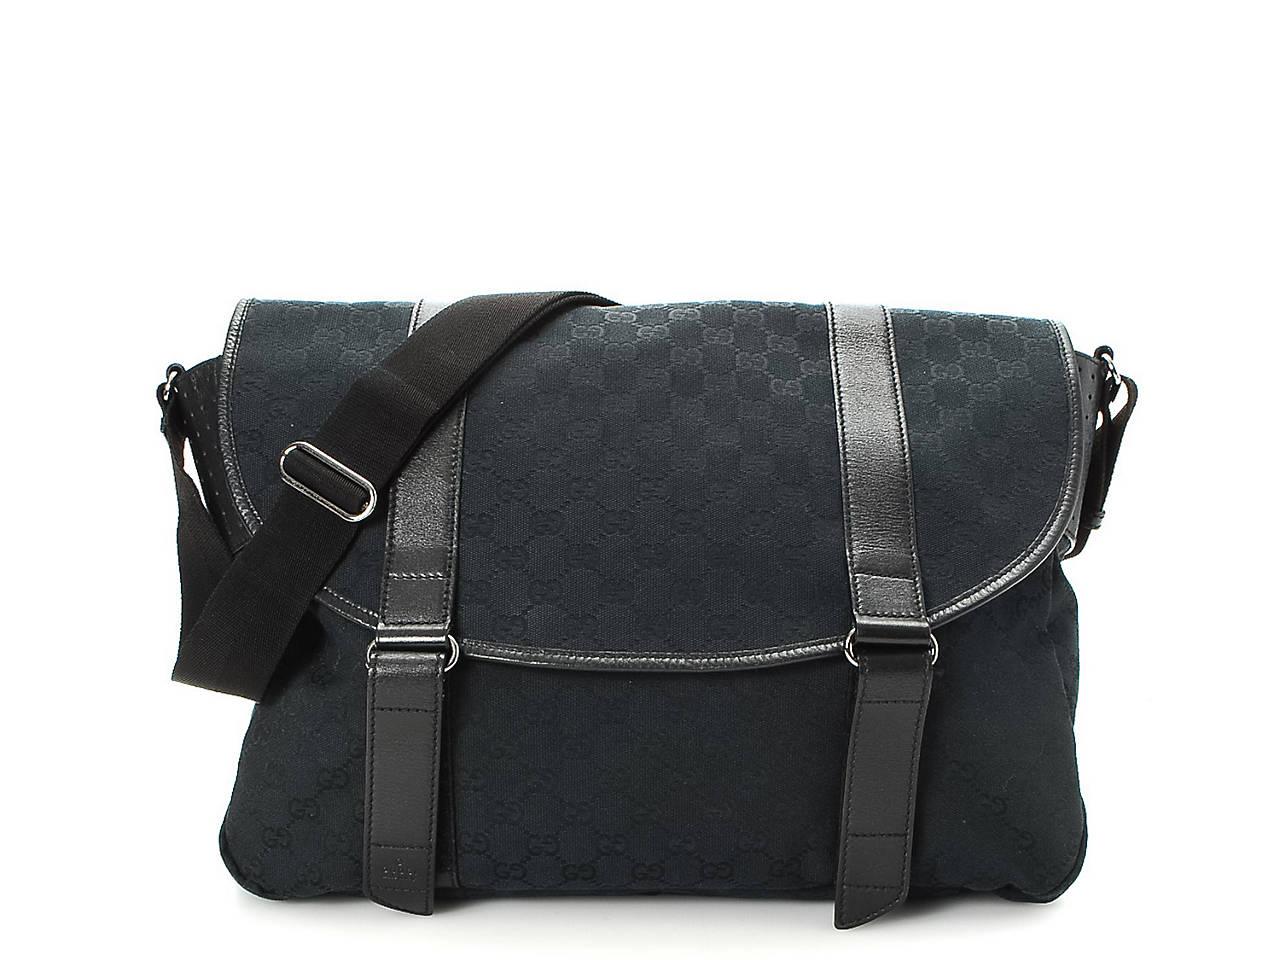 ff0c567a16b Gucci - Vintage Luxury Canvas GG Messenger Bag Women s Handbags ...